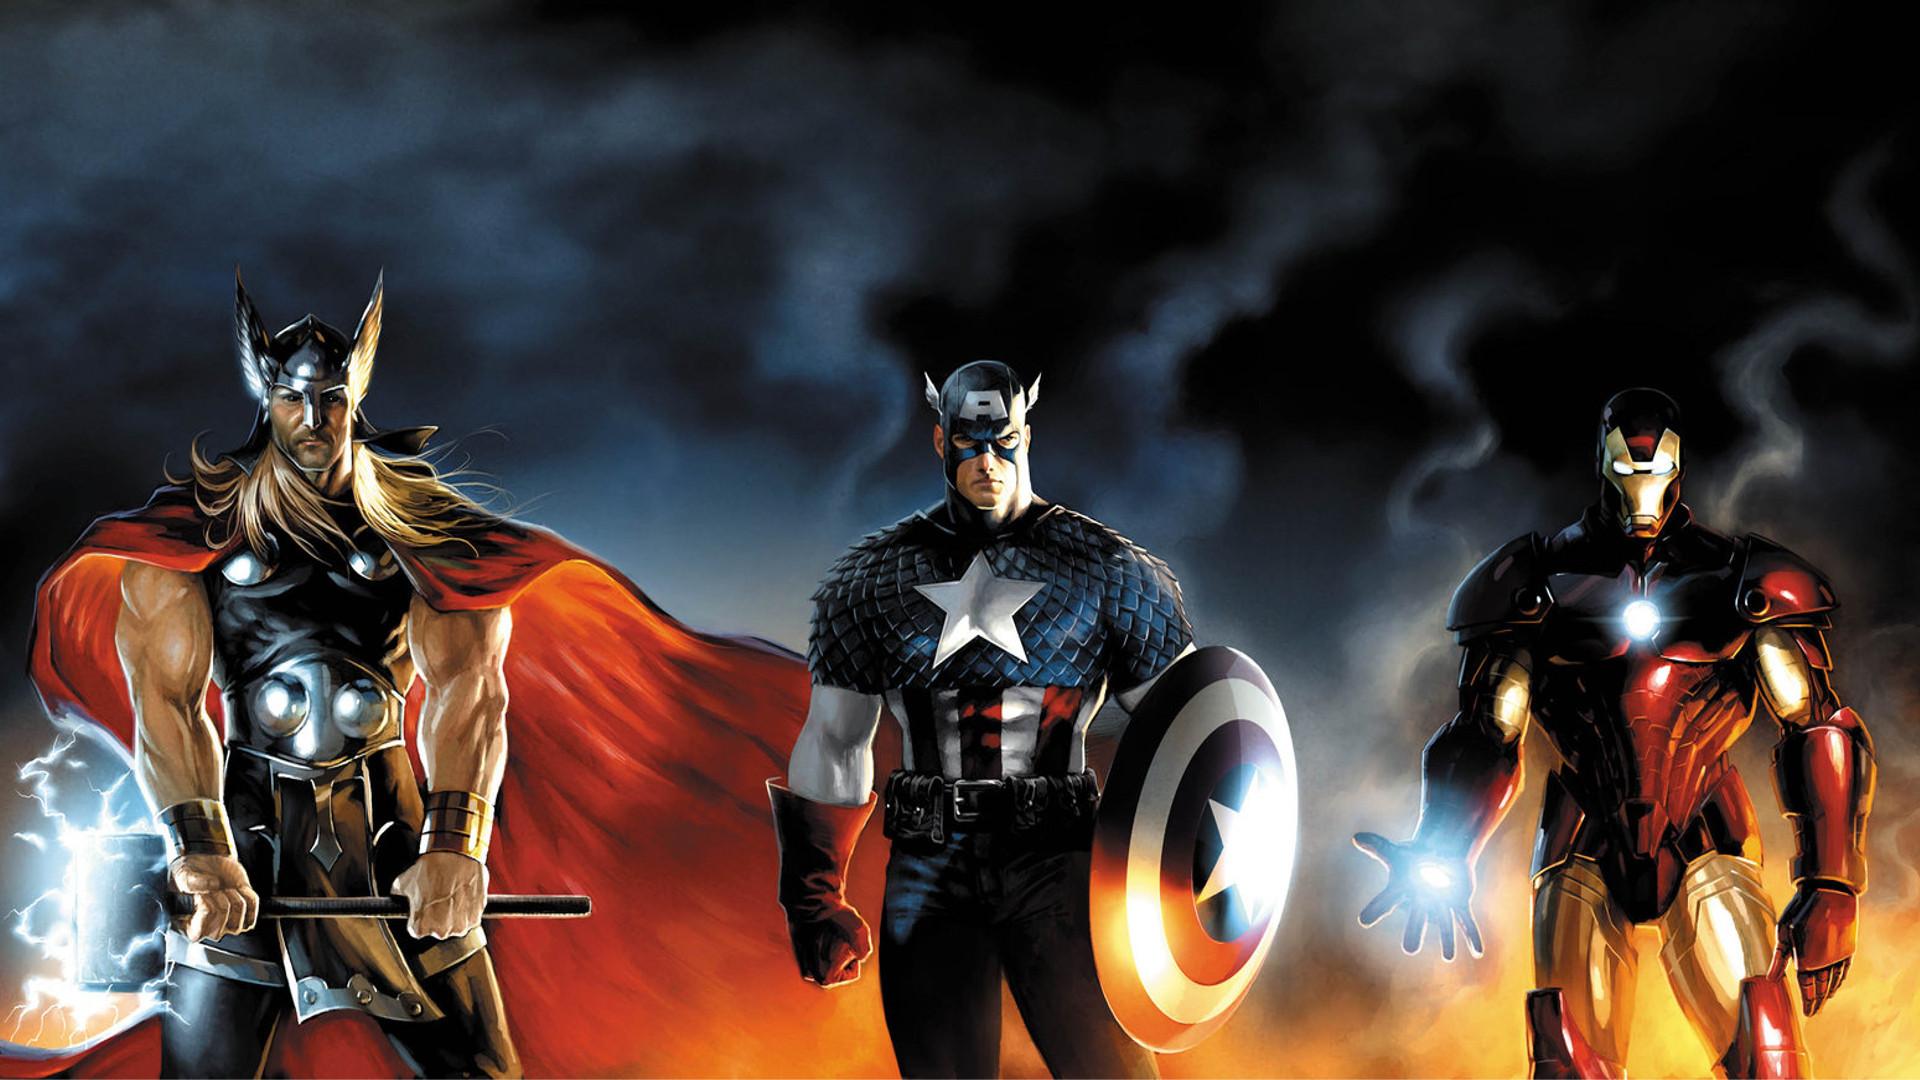 Iron Man Thor Captain America Marvel Comics Wallpapers 1920x1080